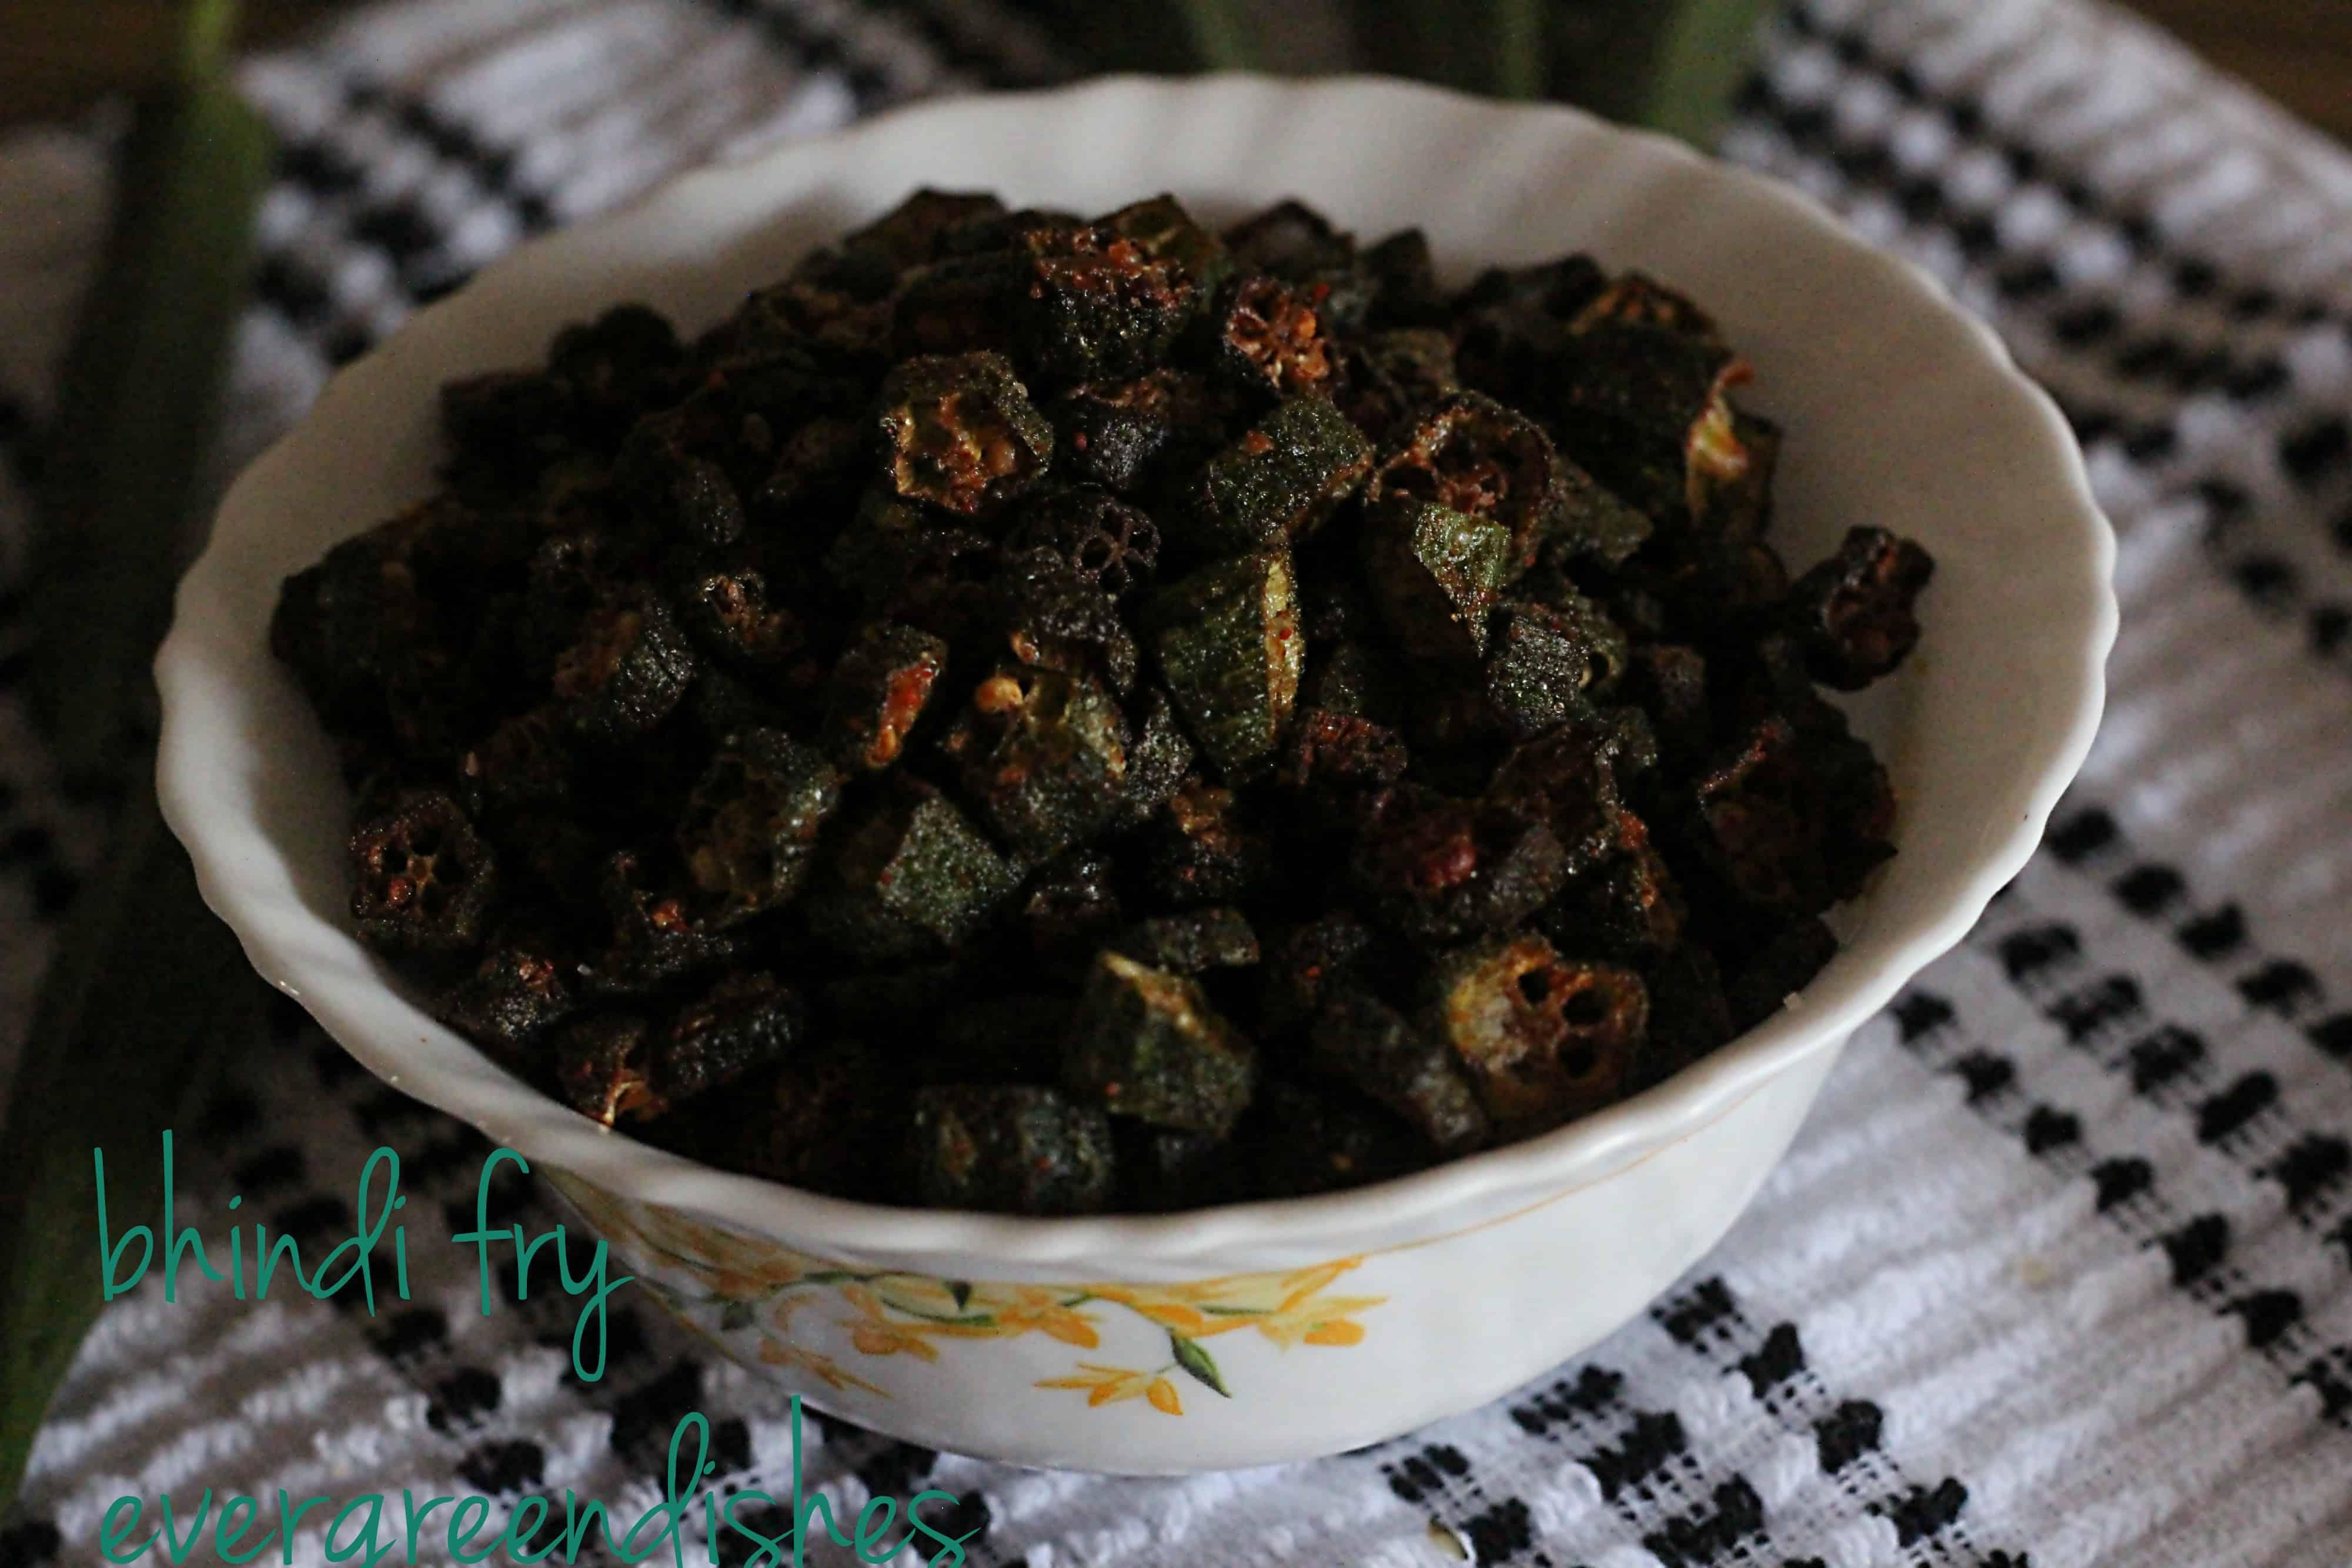 bhindi fry tasty bhindi fry/ ladies finger Tasty Bhindi Fry | okra fry bhindi fry7